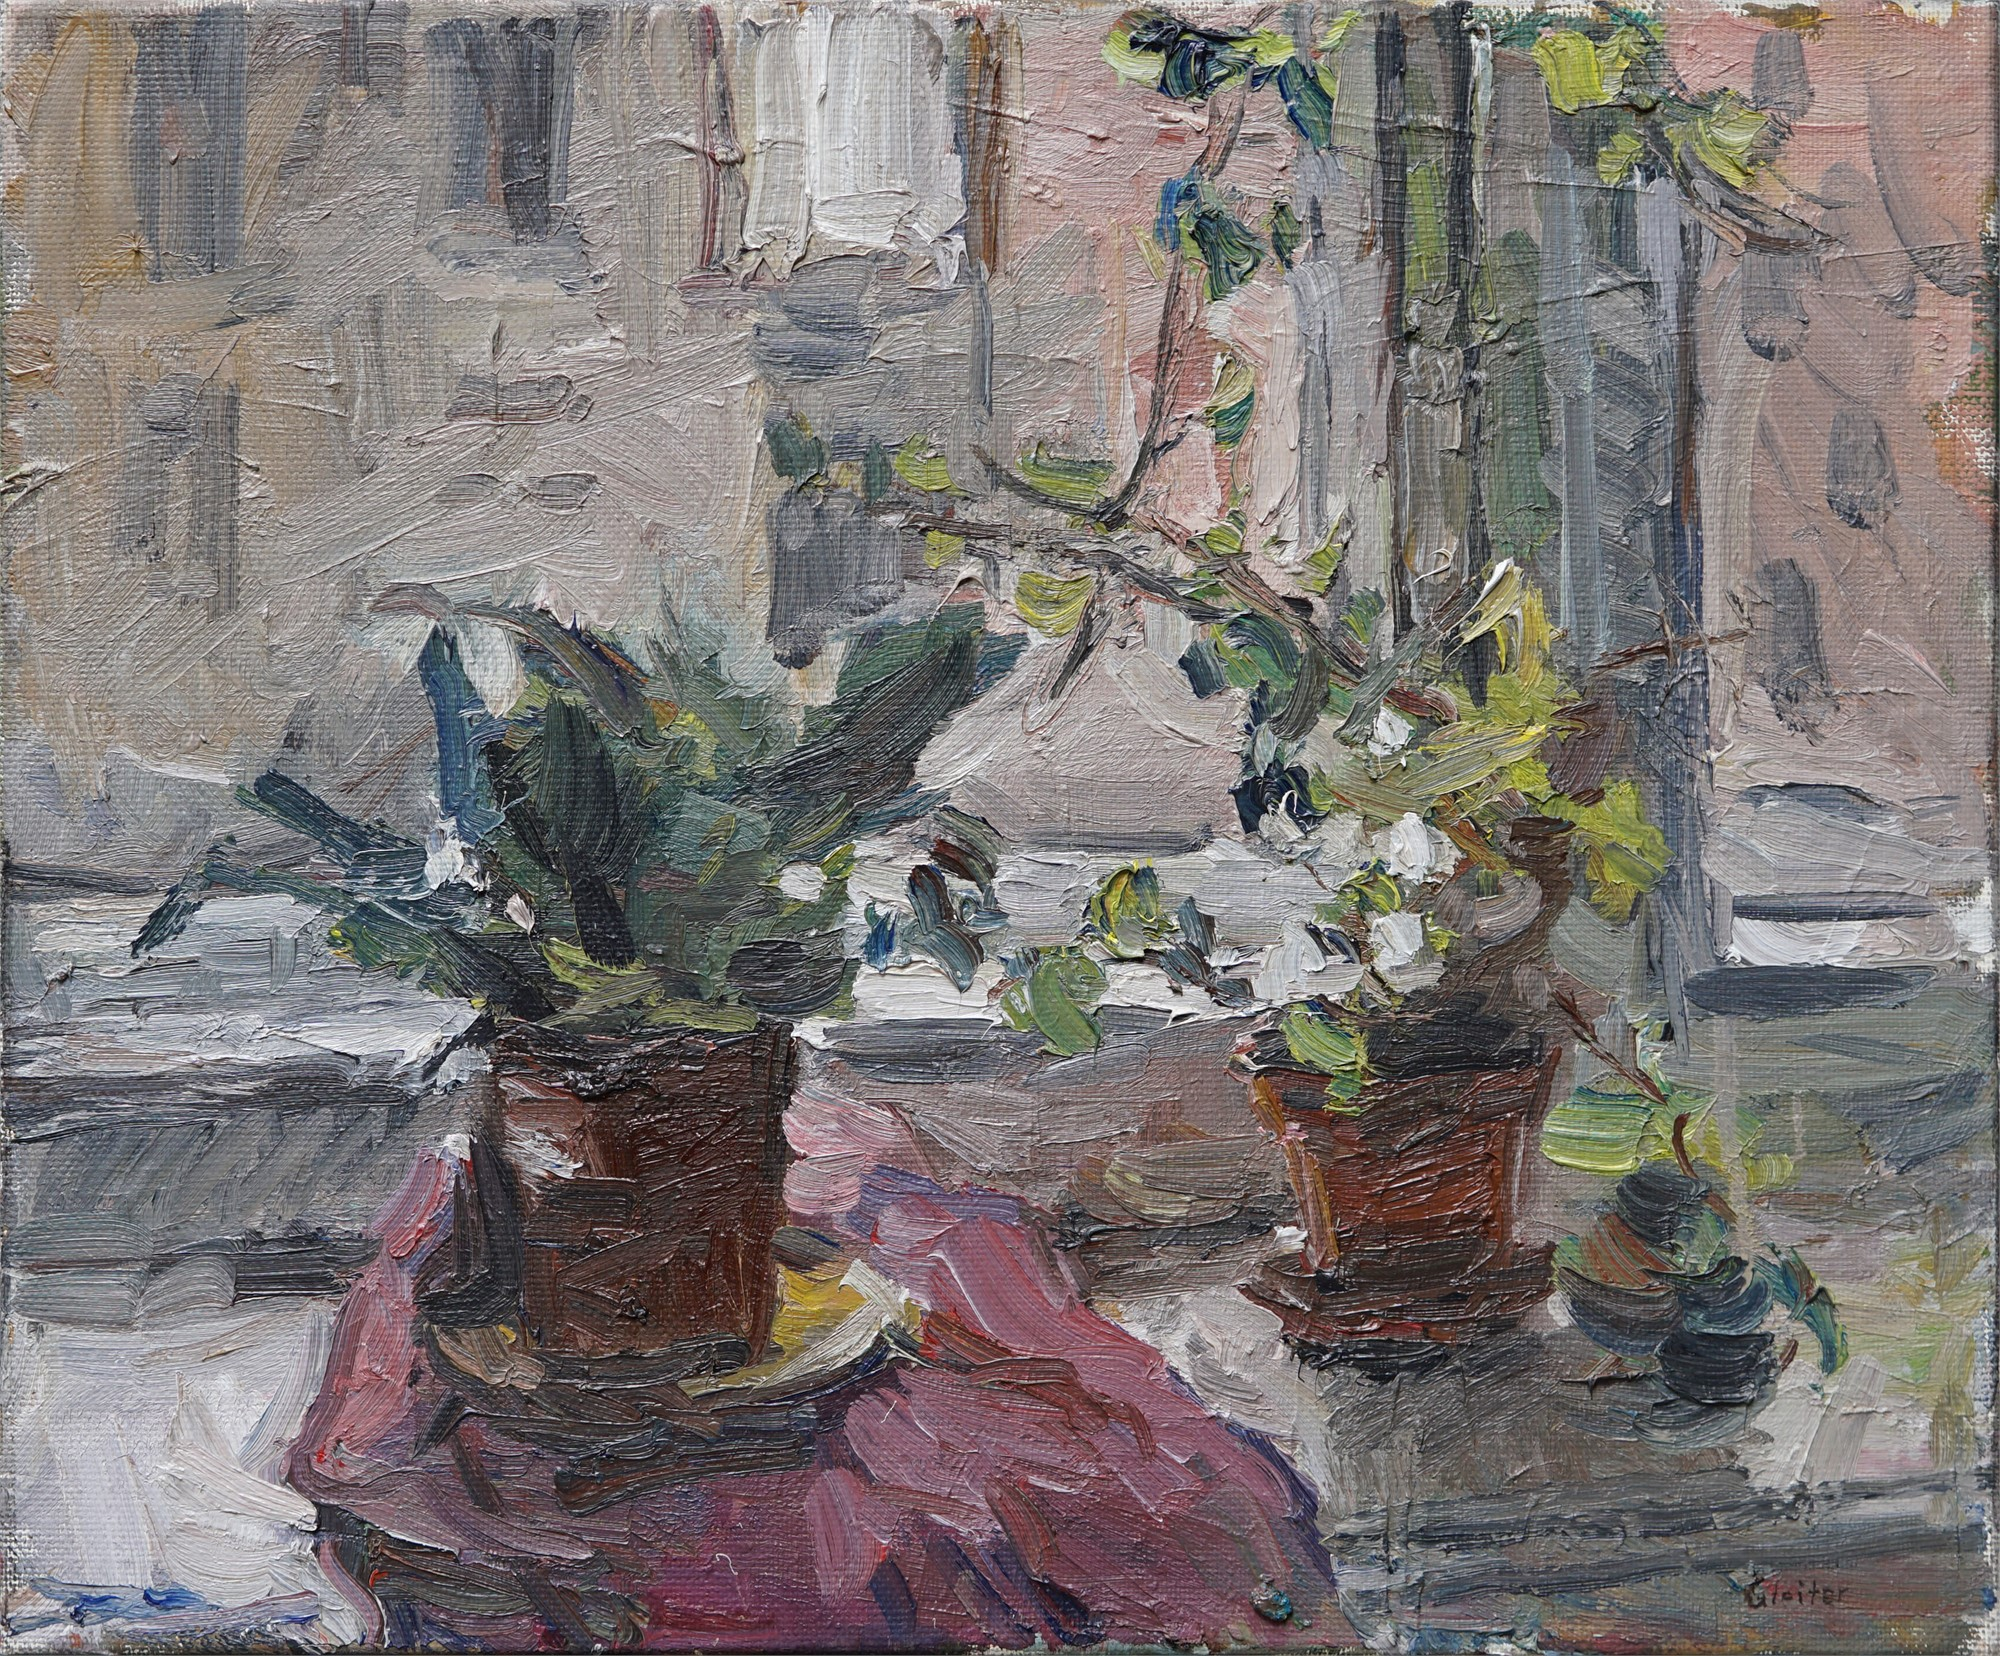 By My Window by Ulrich Gleiter